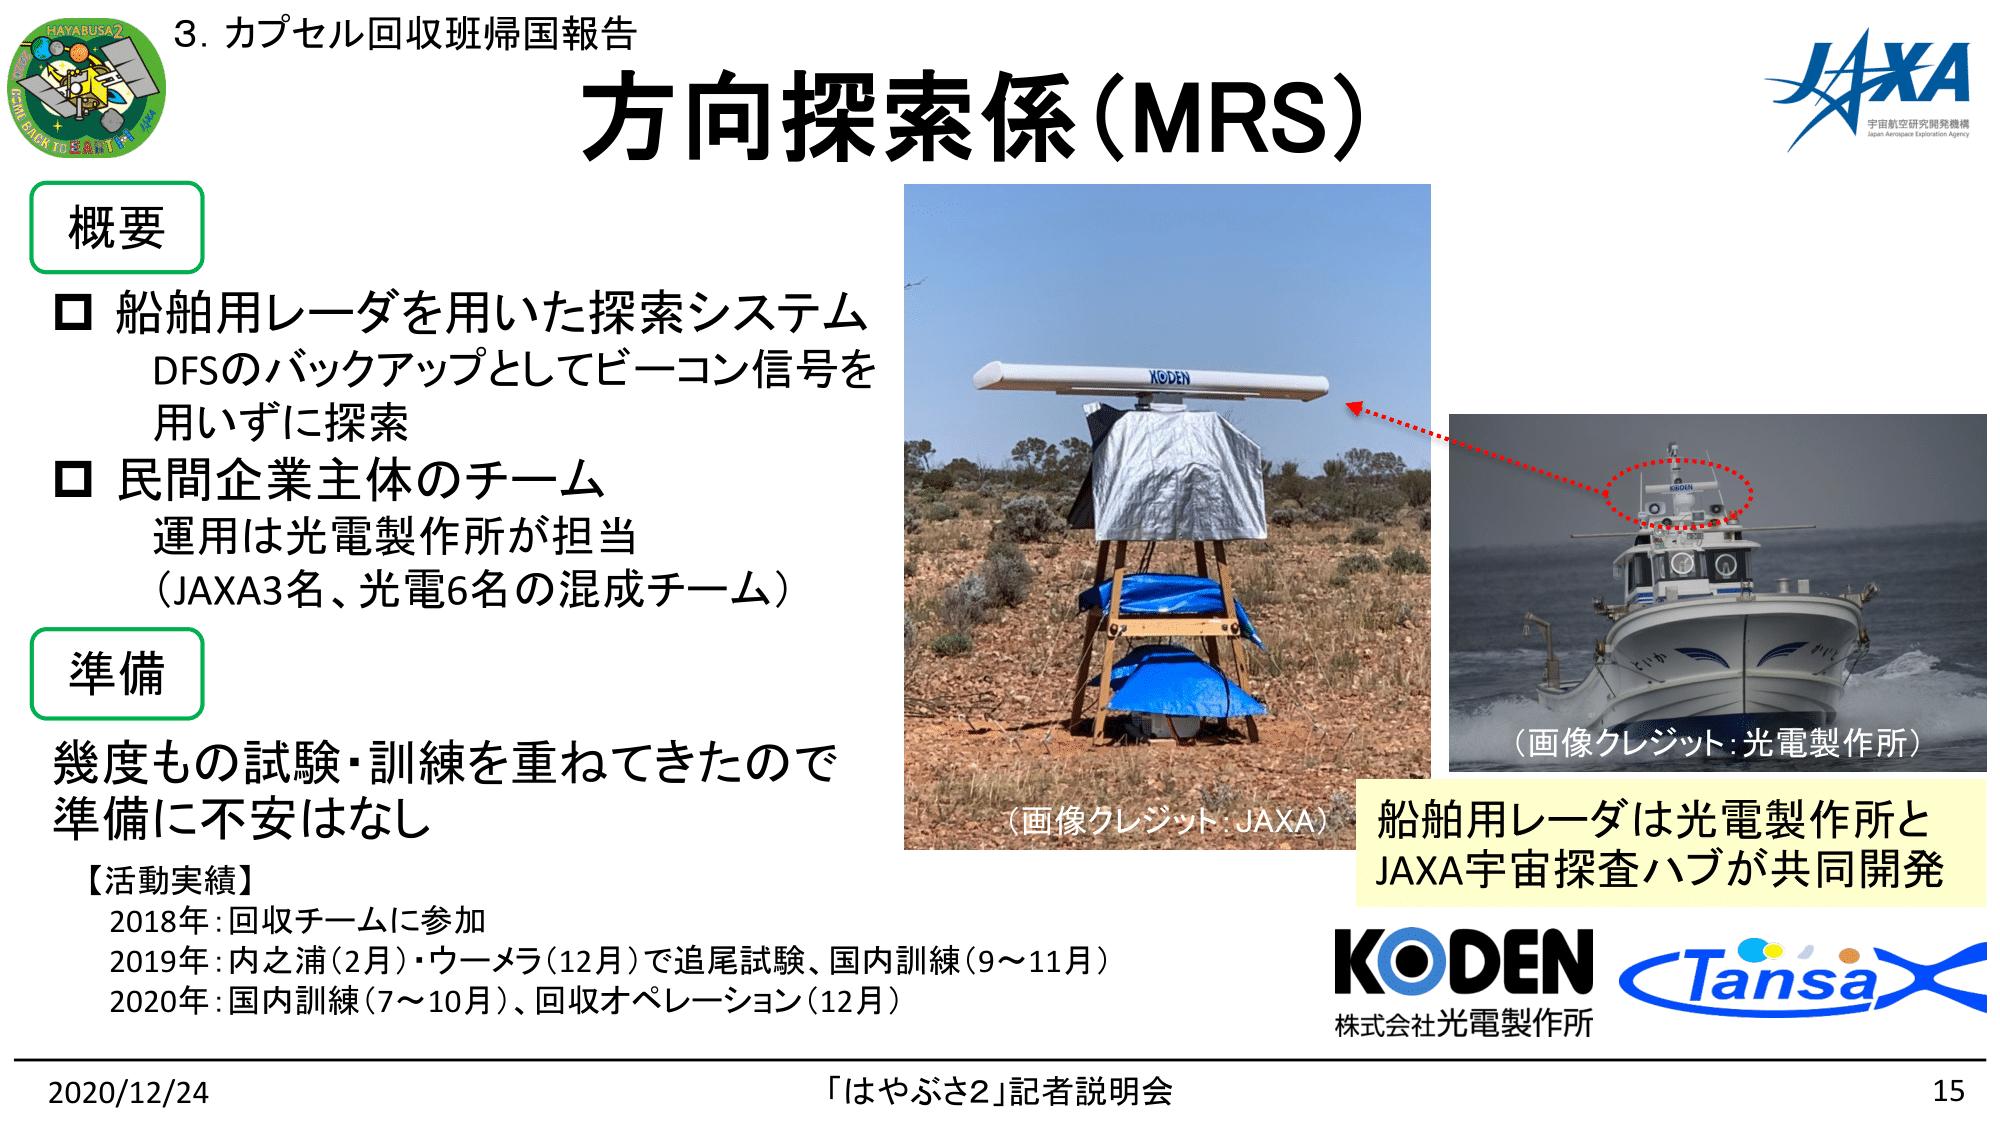 f:id:Imamura:20201224135126p:plain